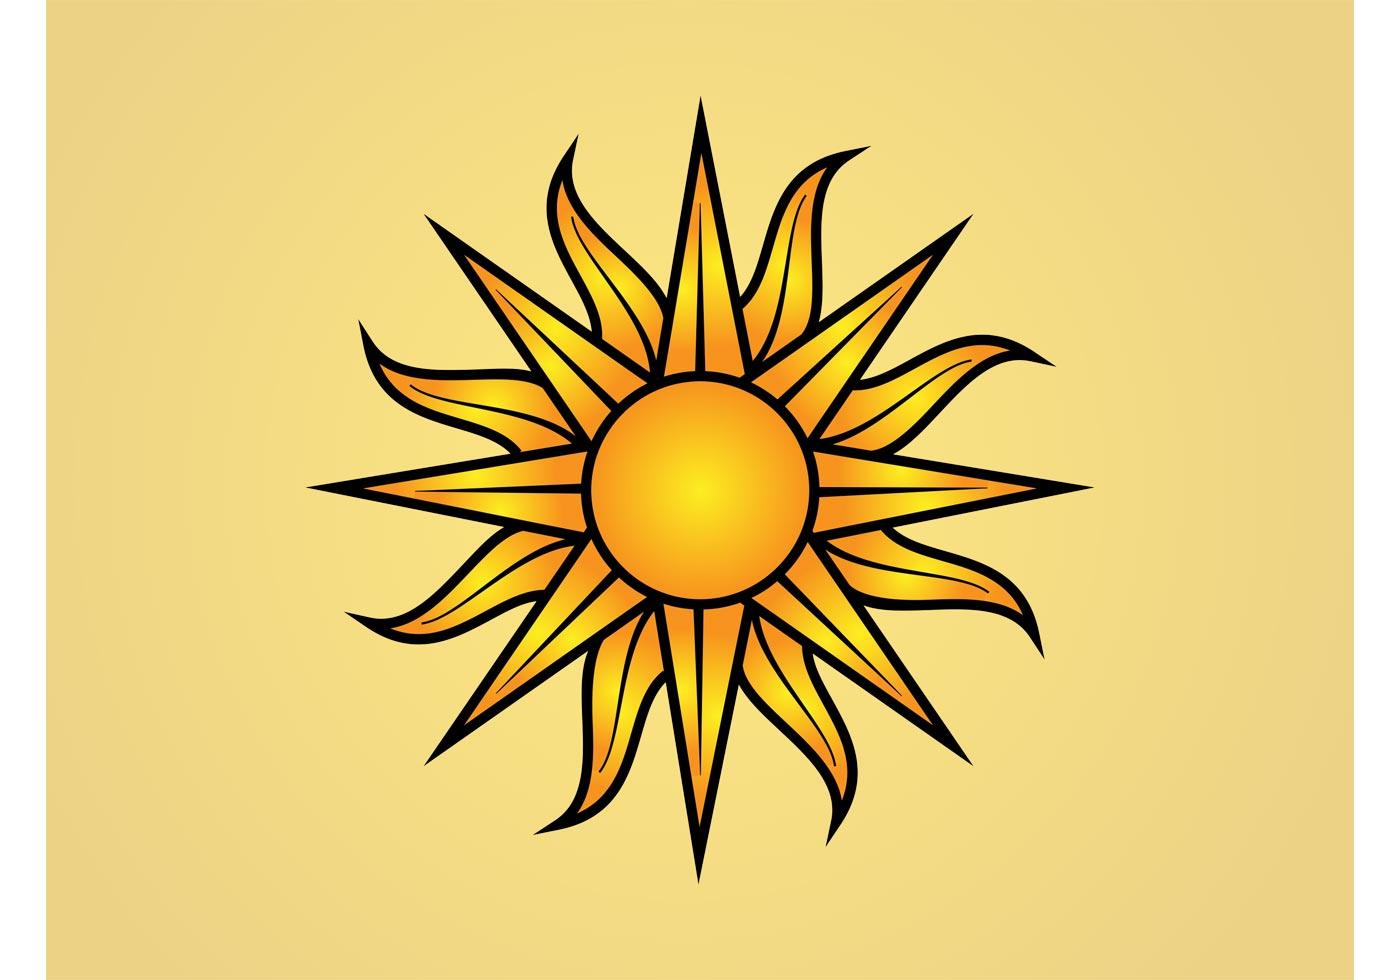 1400x980 Sun Logo Free Vector Art